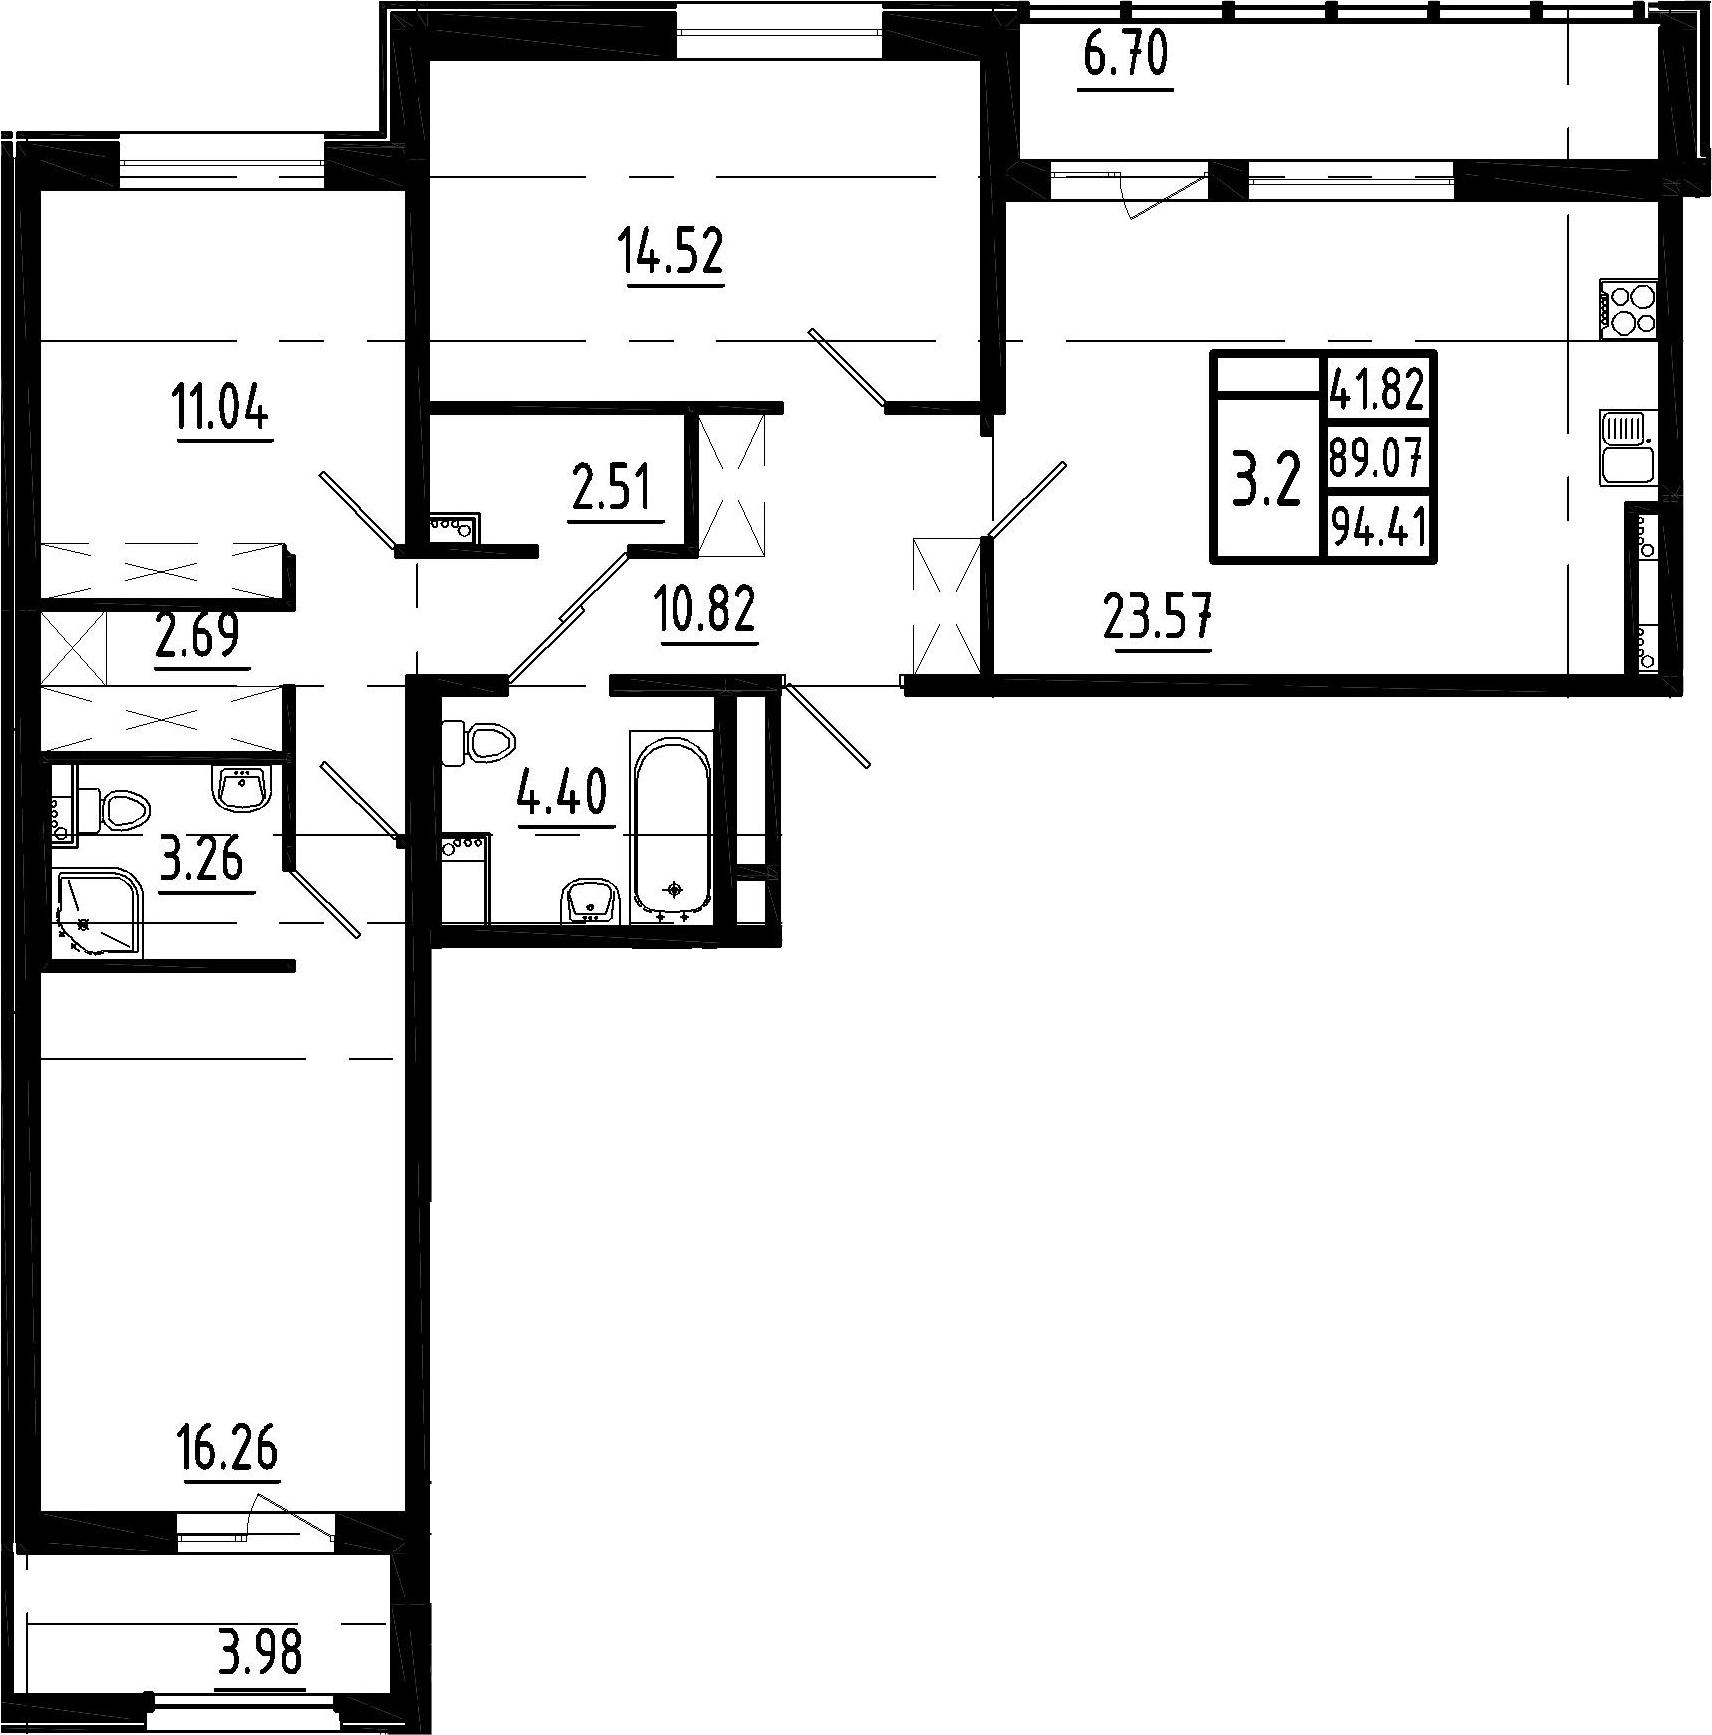 4Е-к.кв, 89.07 м²